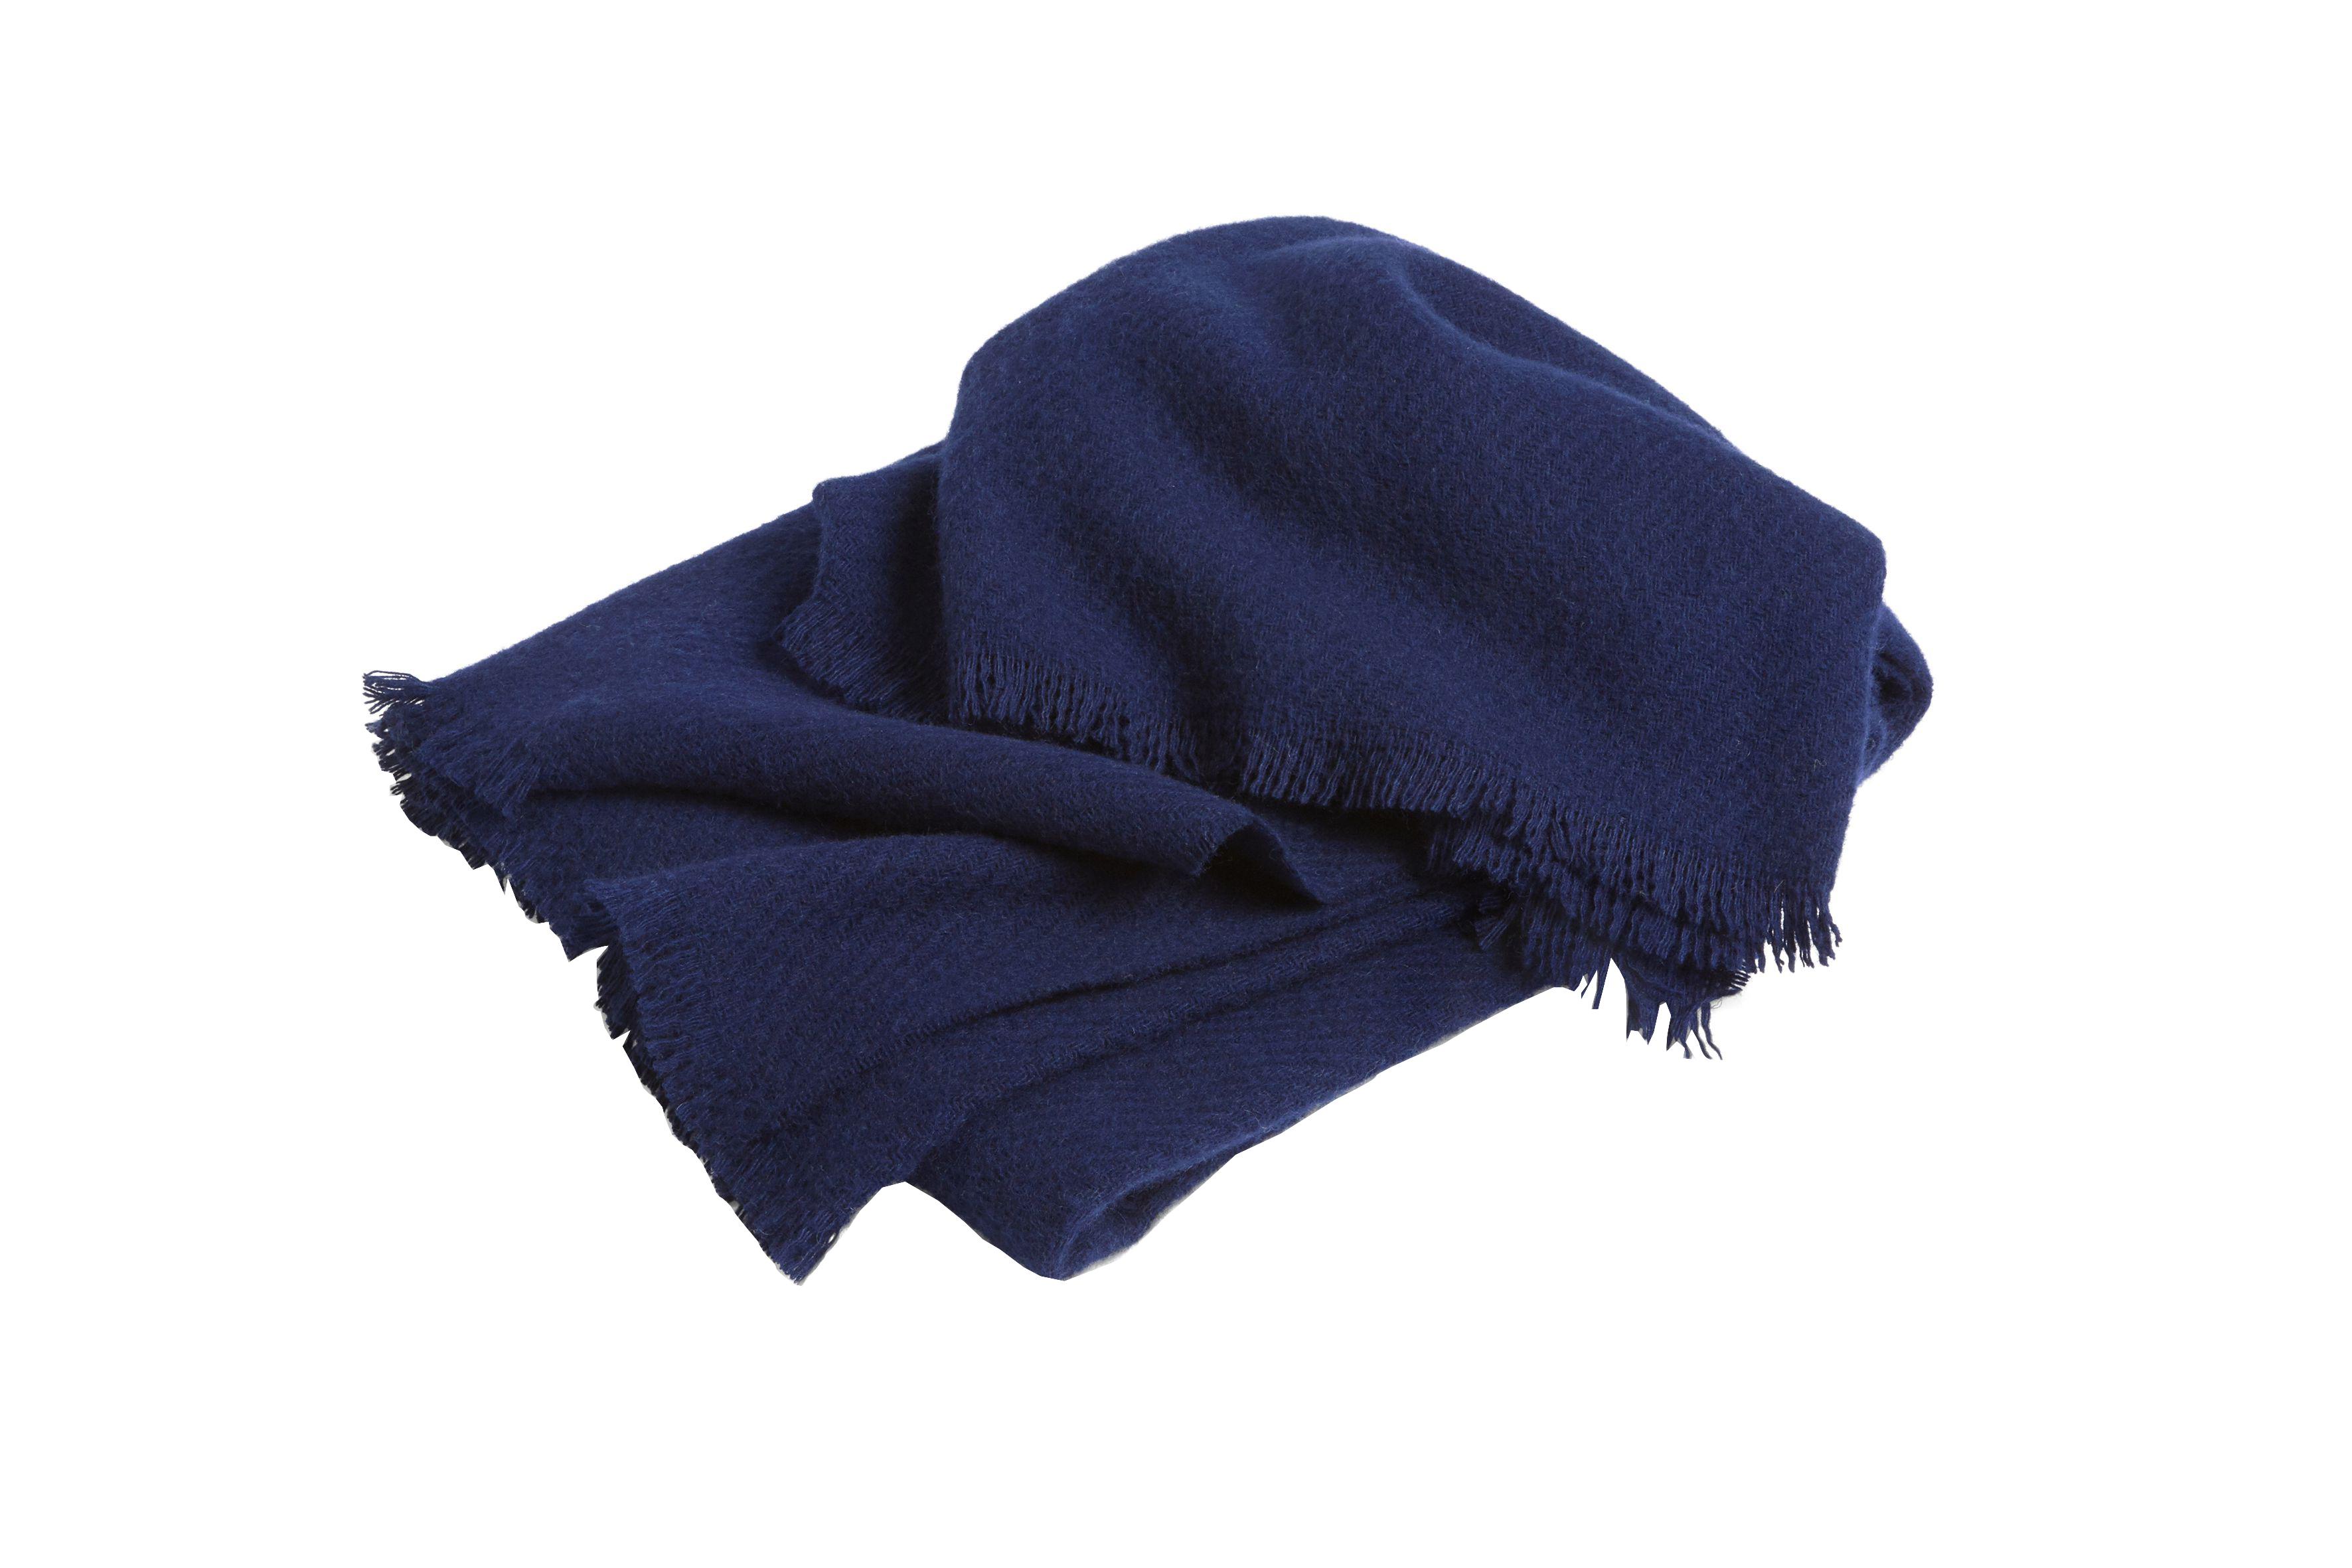 HAY - Mono Blanket 180 x 130 cm - Midnight Blue (507548)